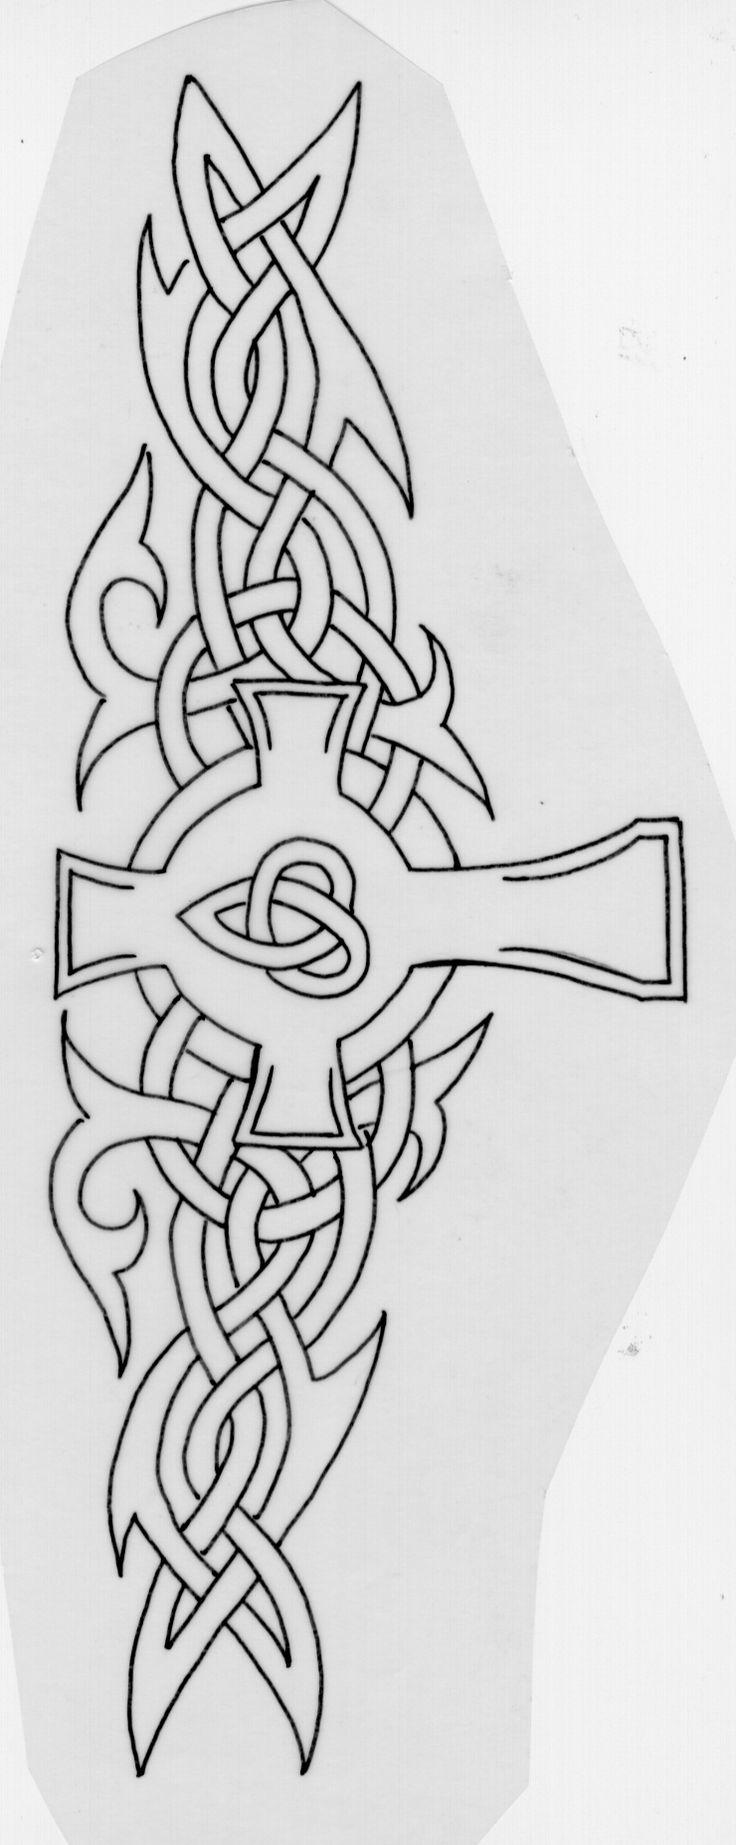 Arm Band Tattoos 92arm23.jpg  follow link to print full size image http://tattoo-advisor.com/tattoo-images/Arm-Band-Tattoos/bigimage.php?images/Arm_Band_Tattoos_92arm23.jpg